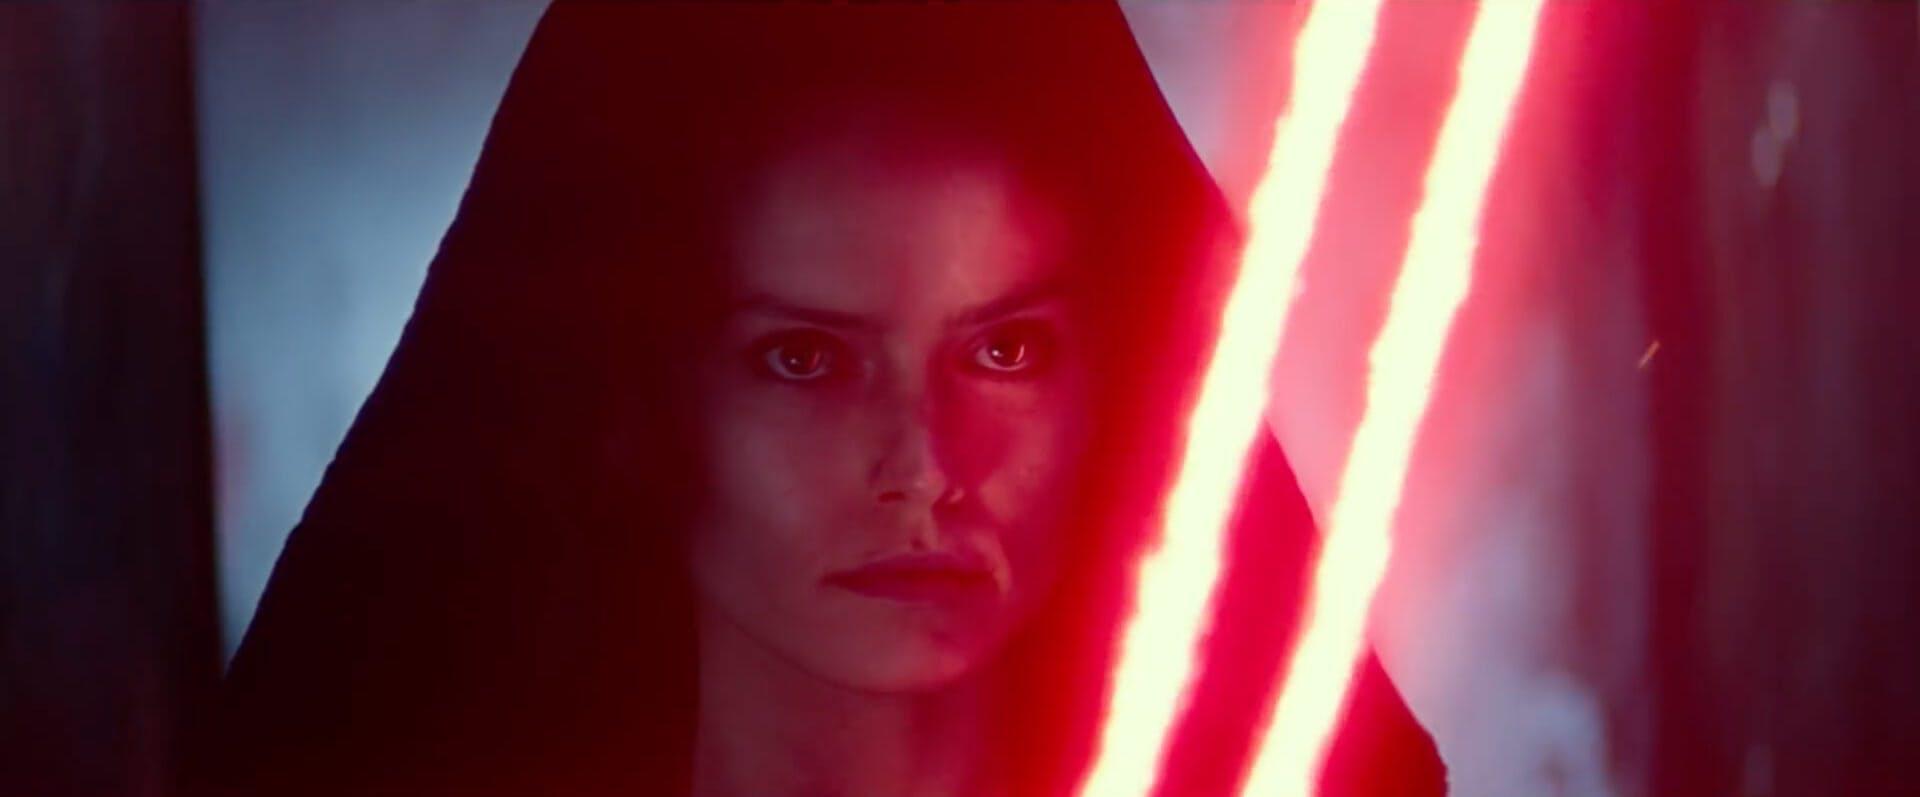 The Rise of Skywalker - Rey